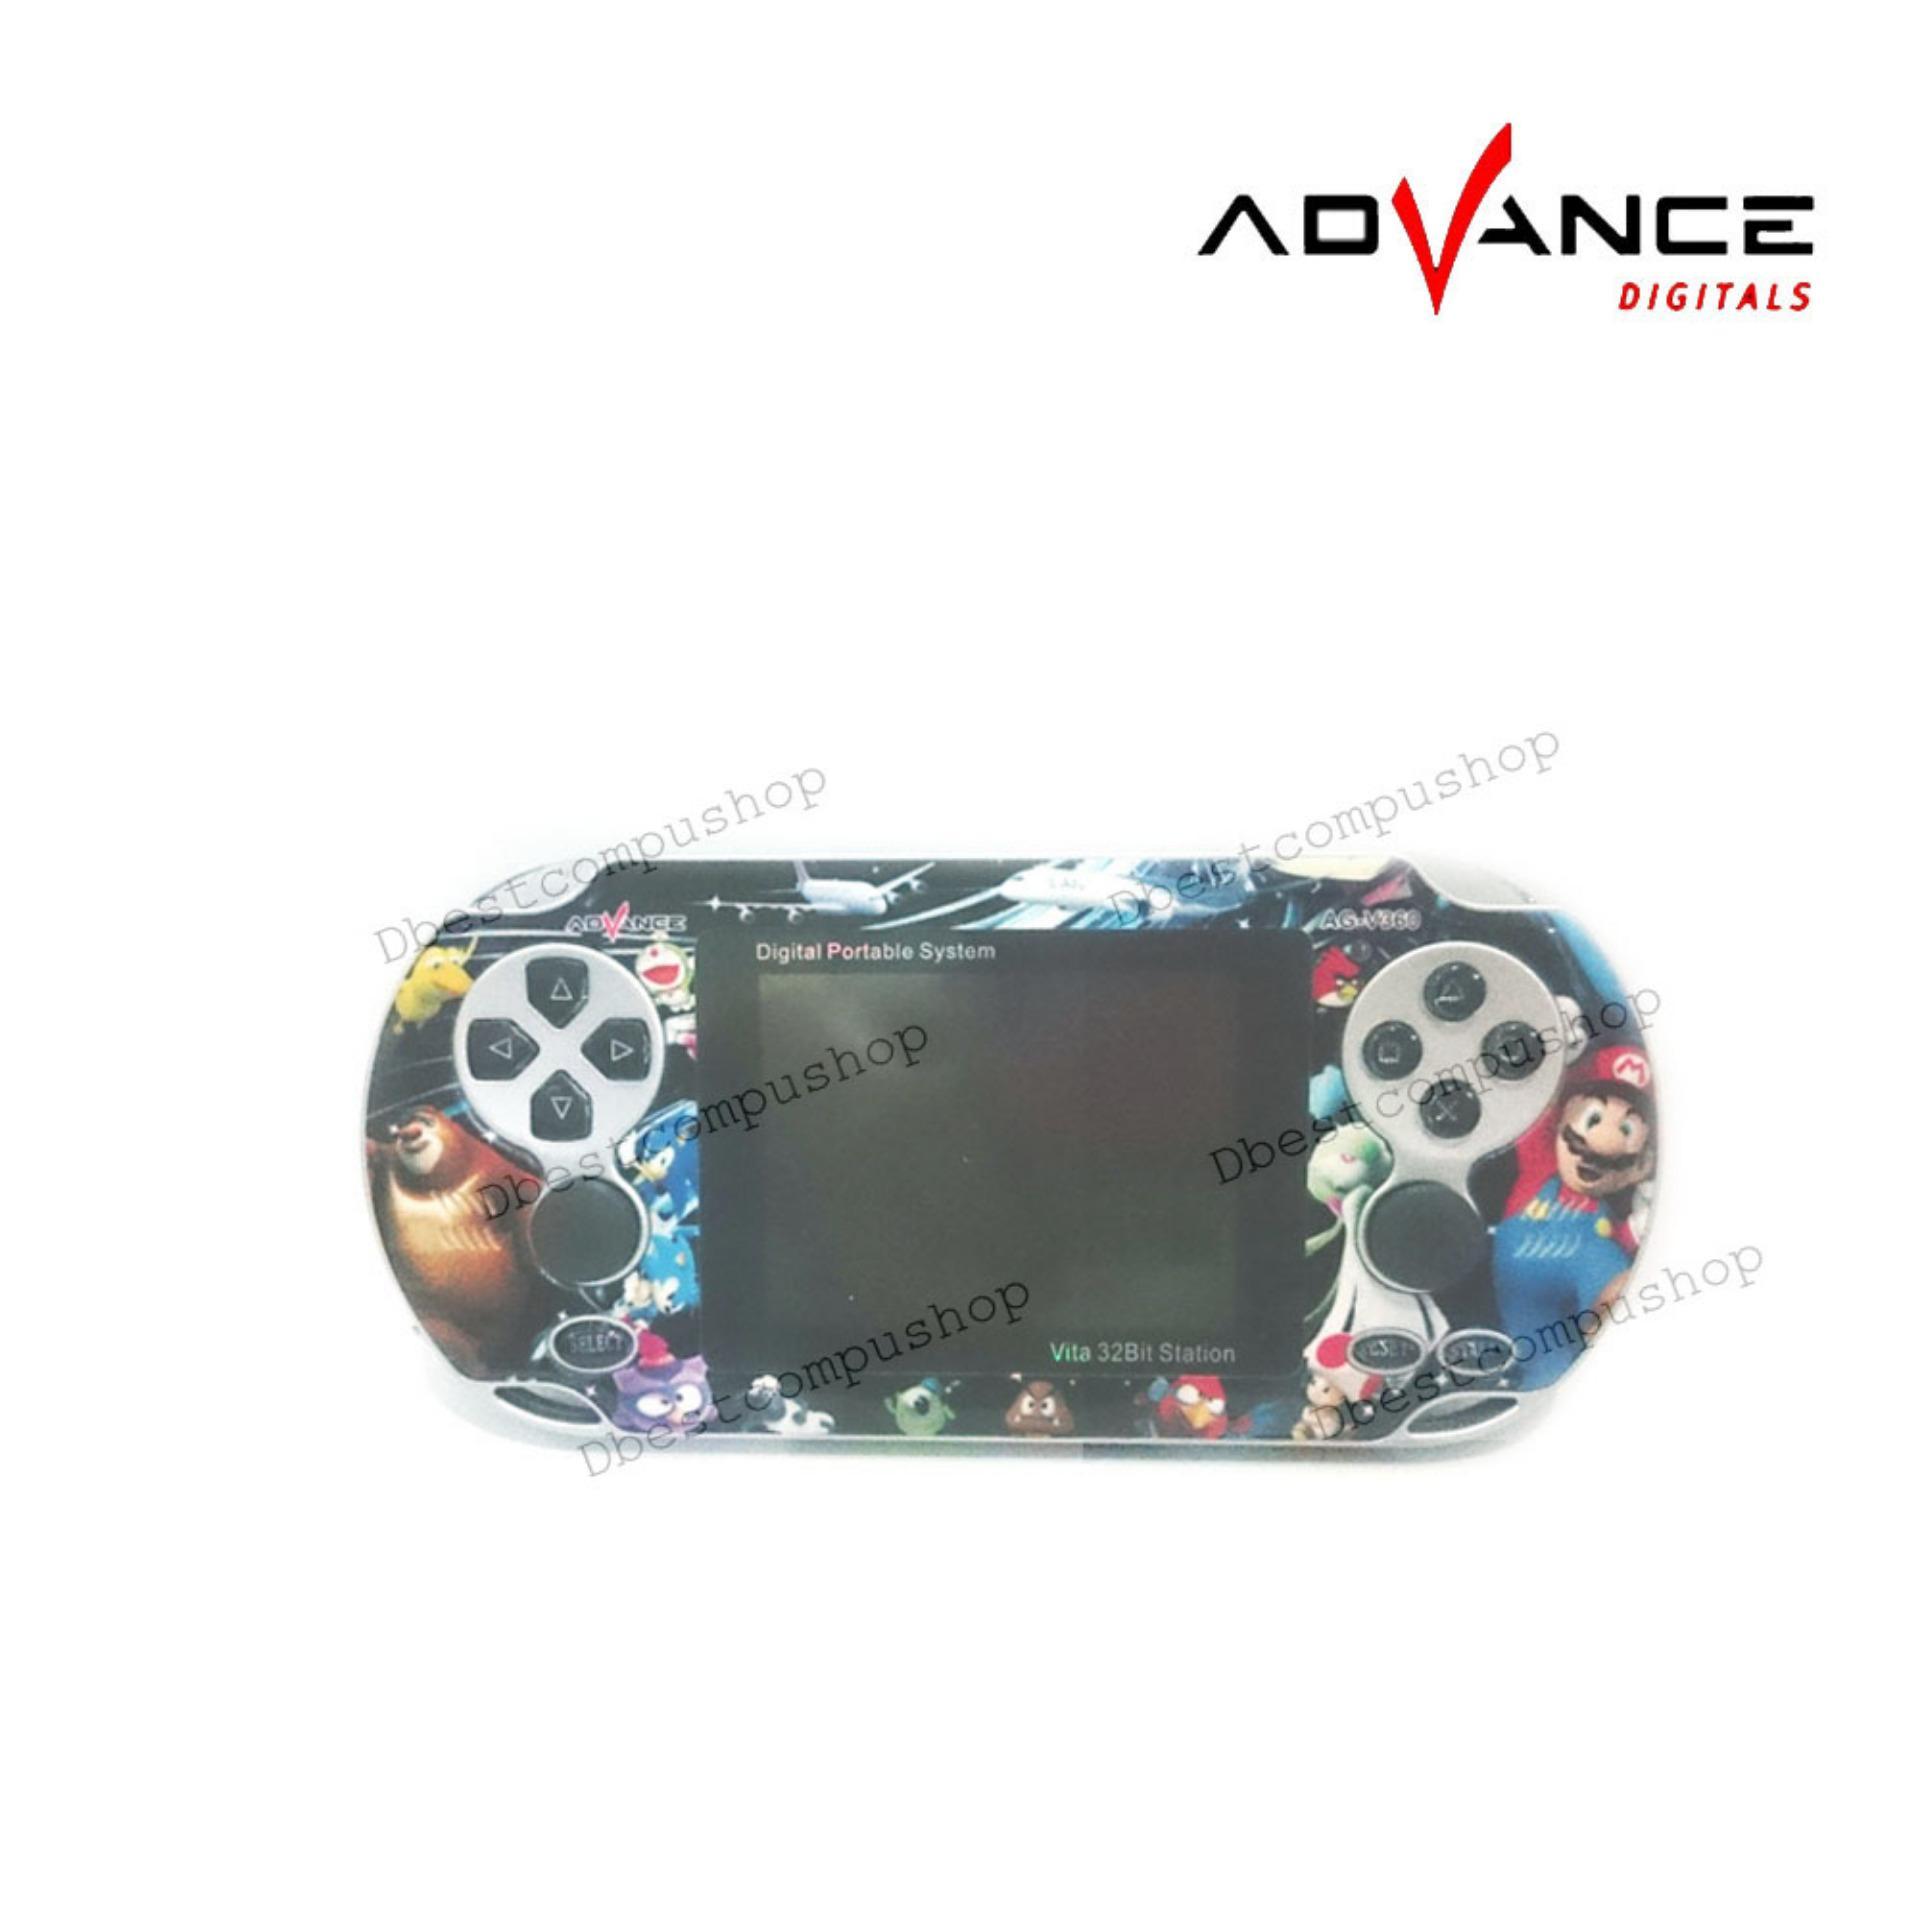 Advance AGV360 Pocket Game 32Bit - Random